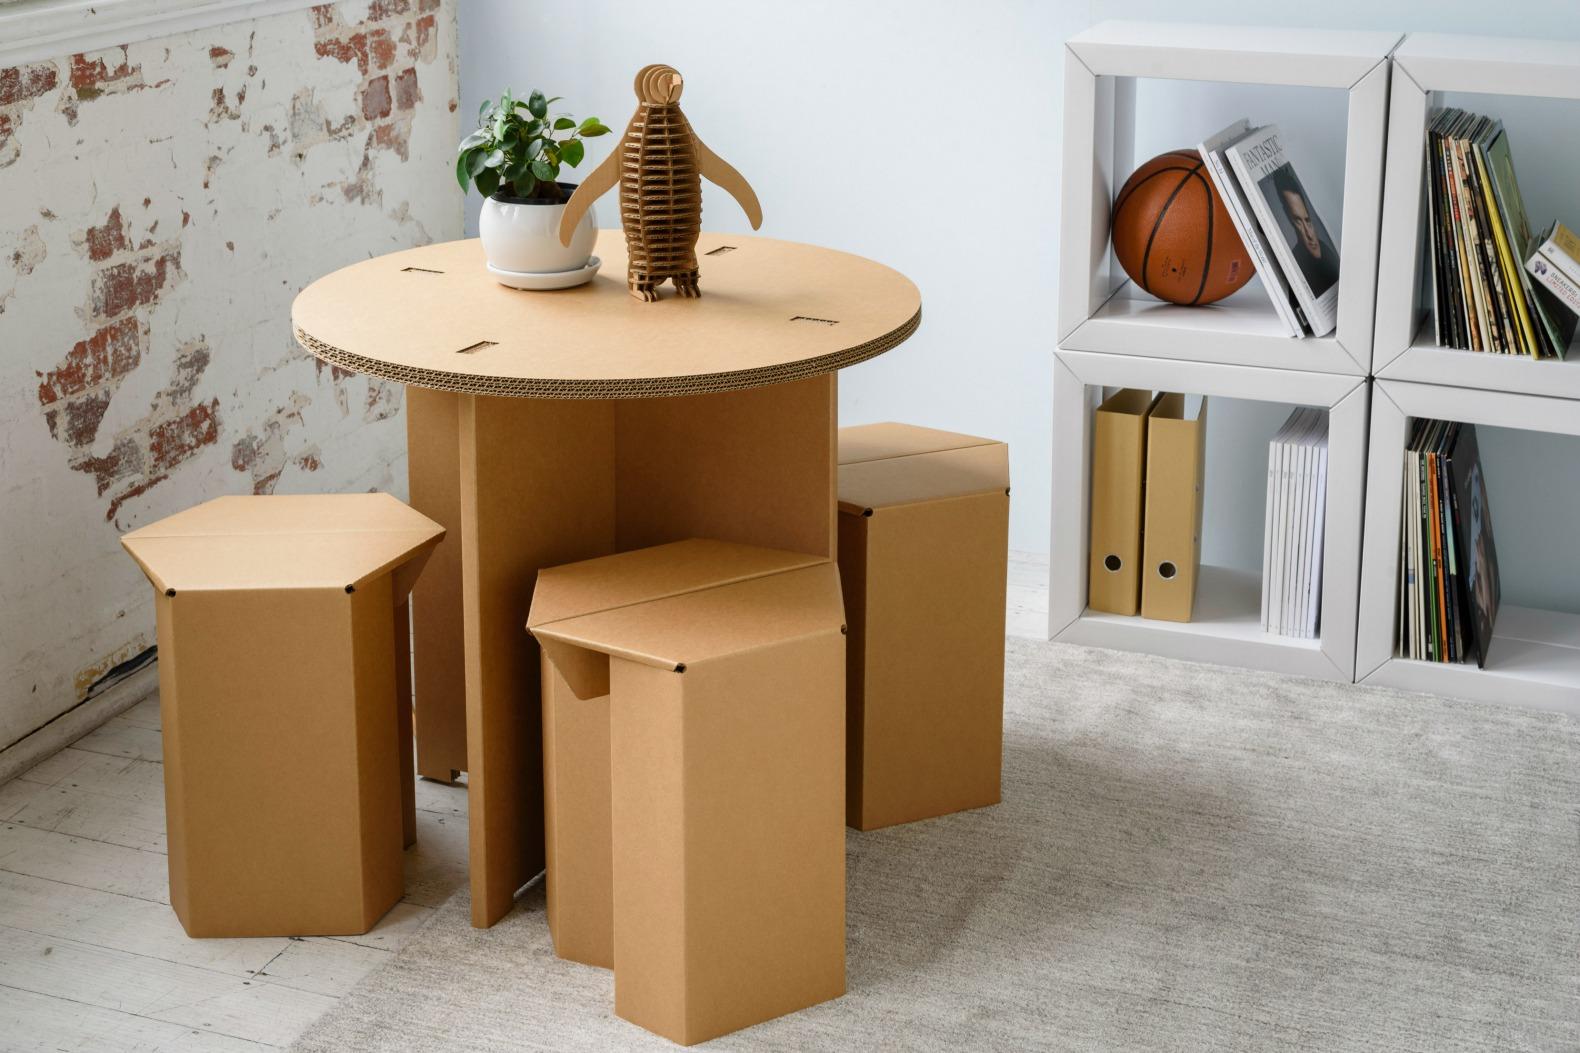 Karton Creates Ultra-durable Cardboard Furniture For Every